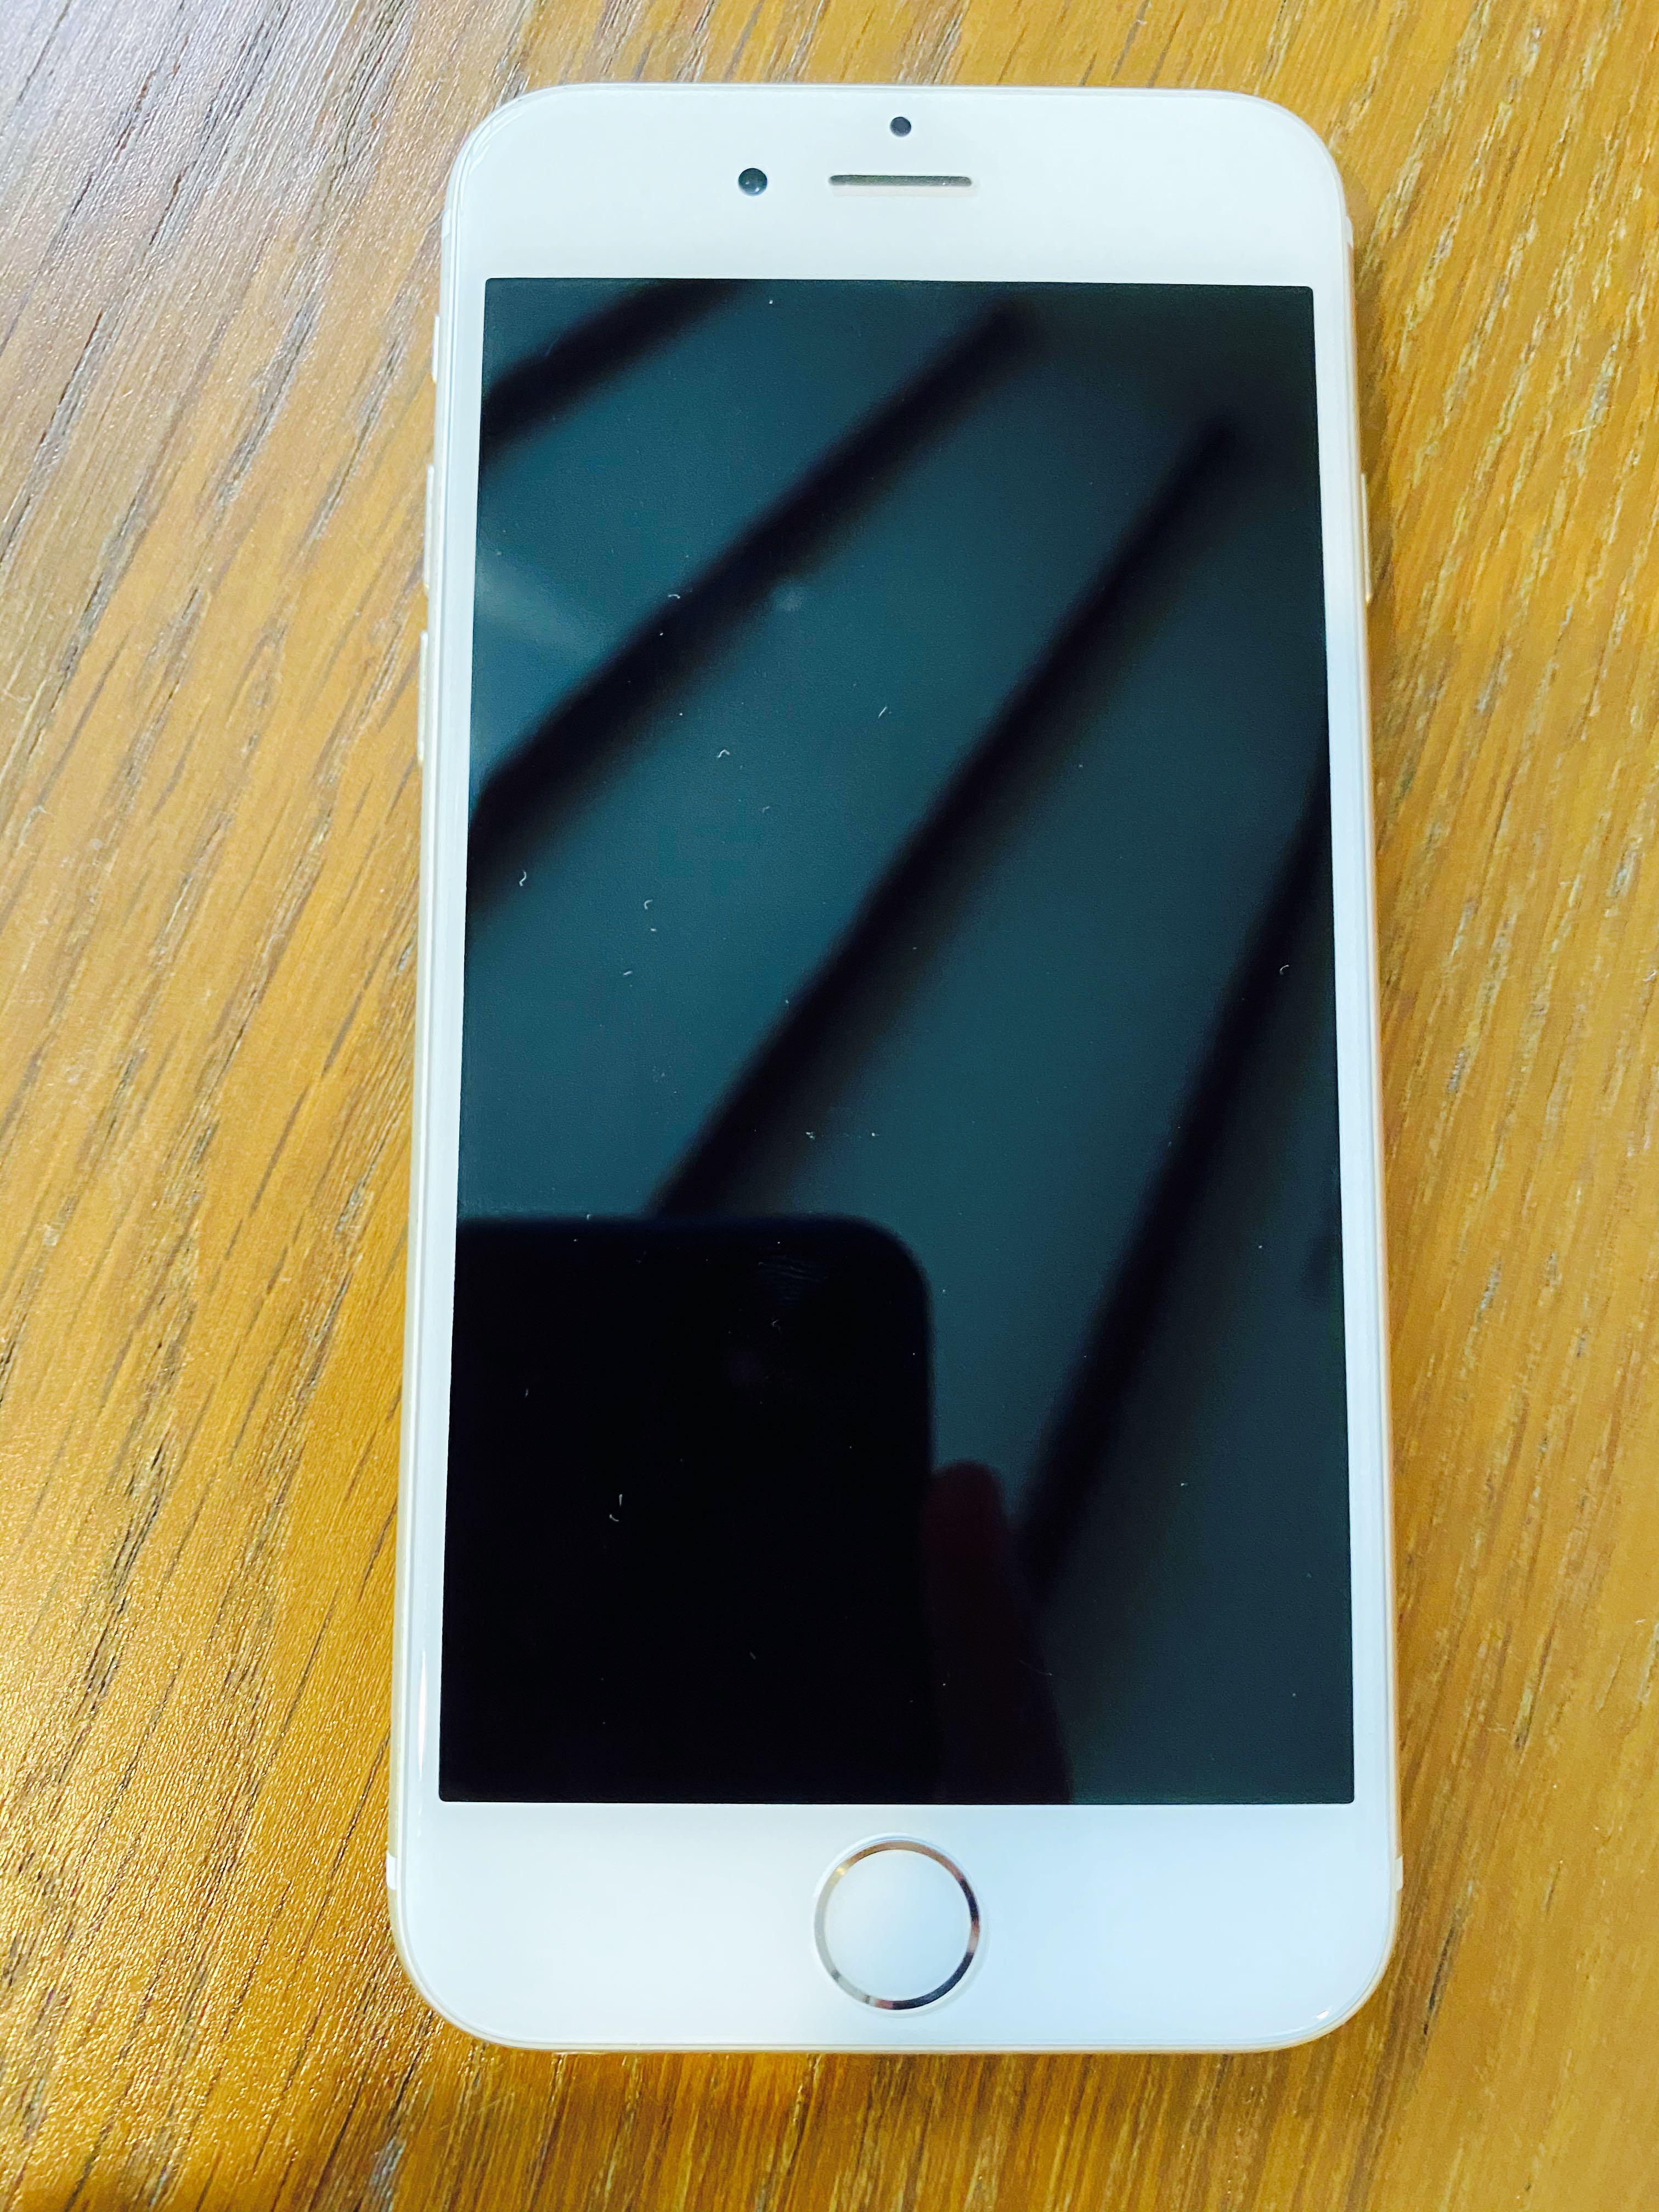 IPhone 6 // Gold // 64GB